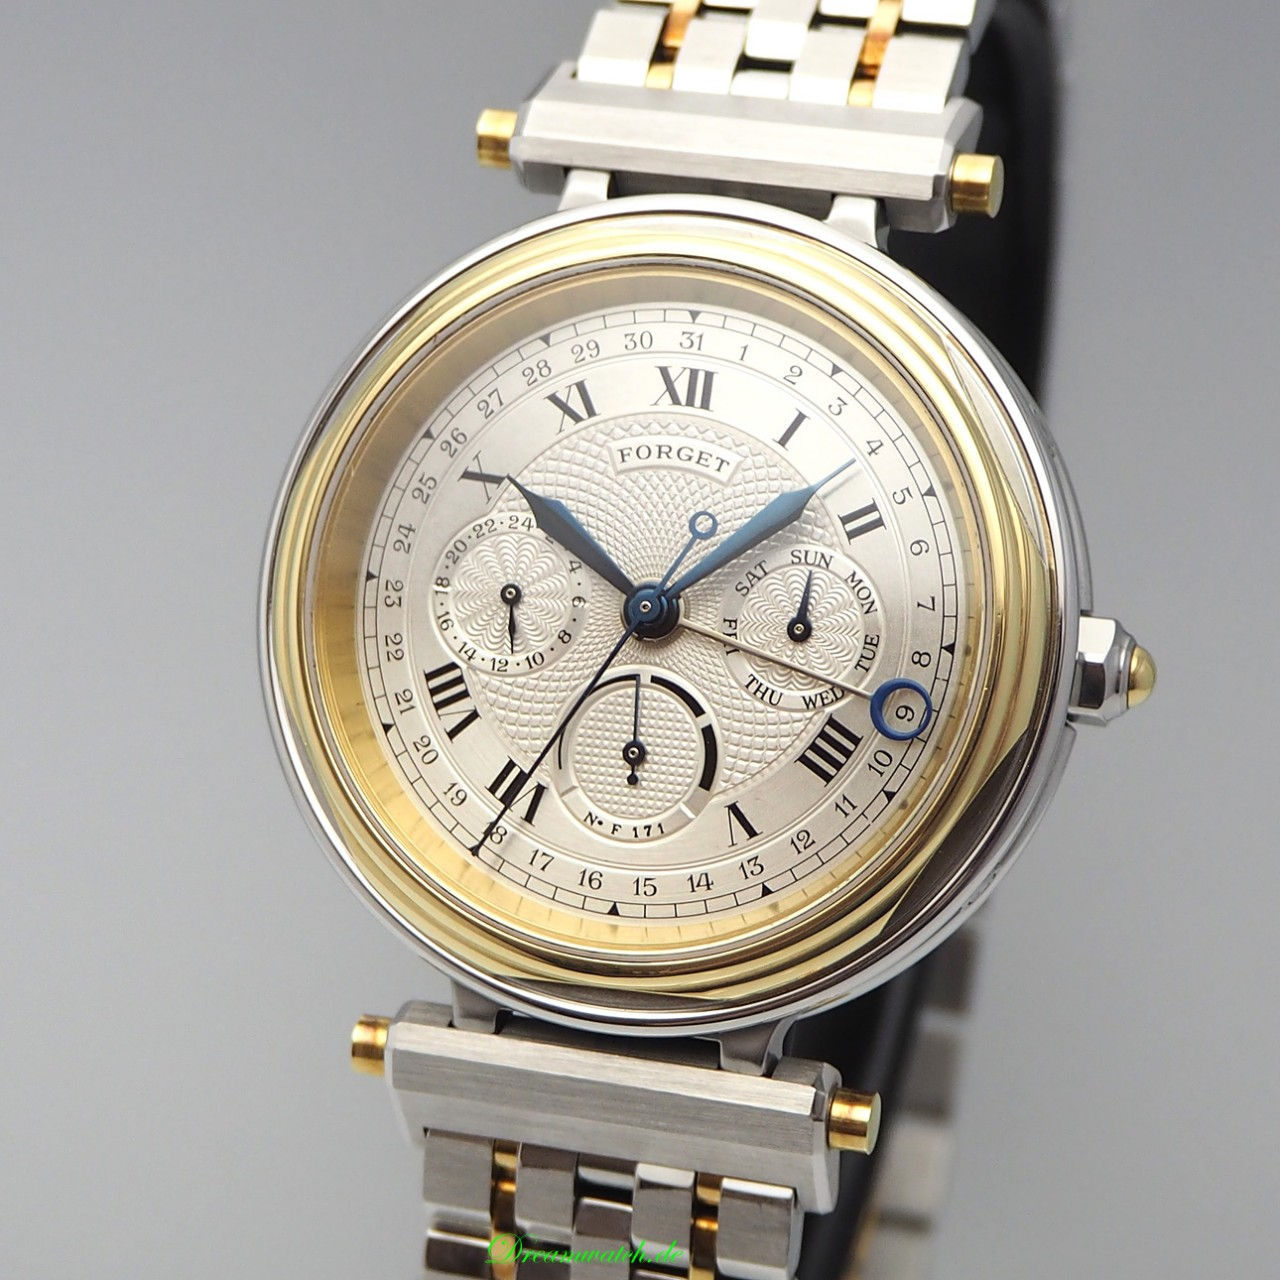 Forget Chronometre Full Calender GMT, F-Series, Box+Papiere